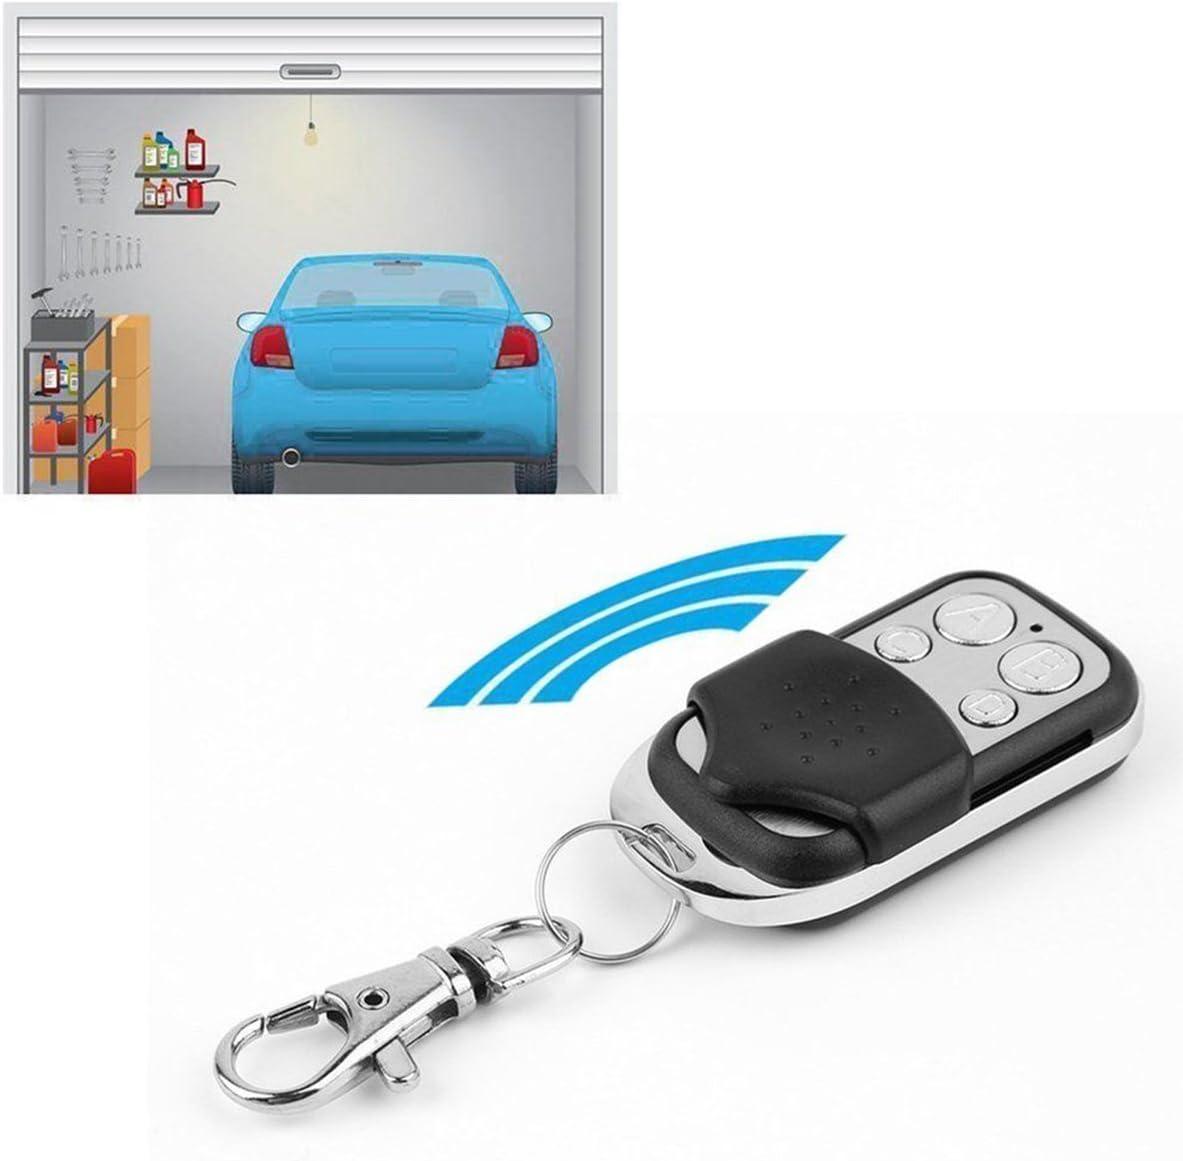 Universal Cloning Remote Control Key Fob For Car Garage Electric Door Gate H1N6